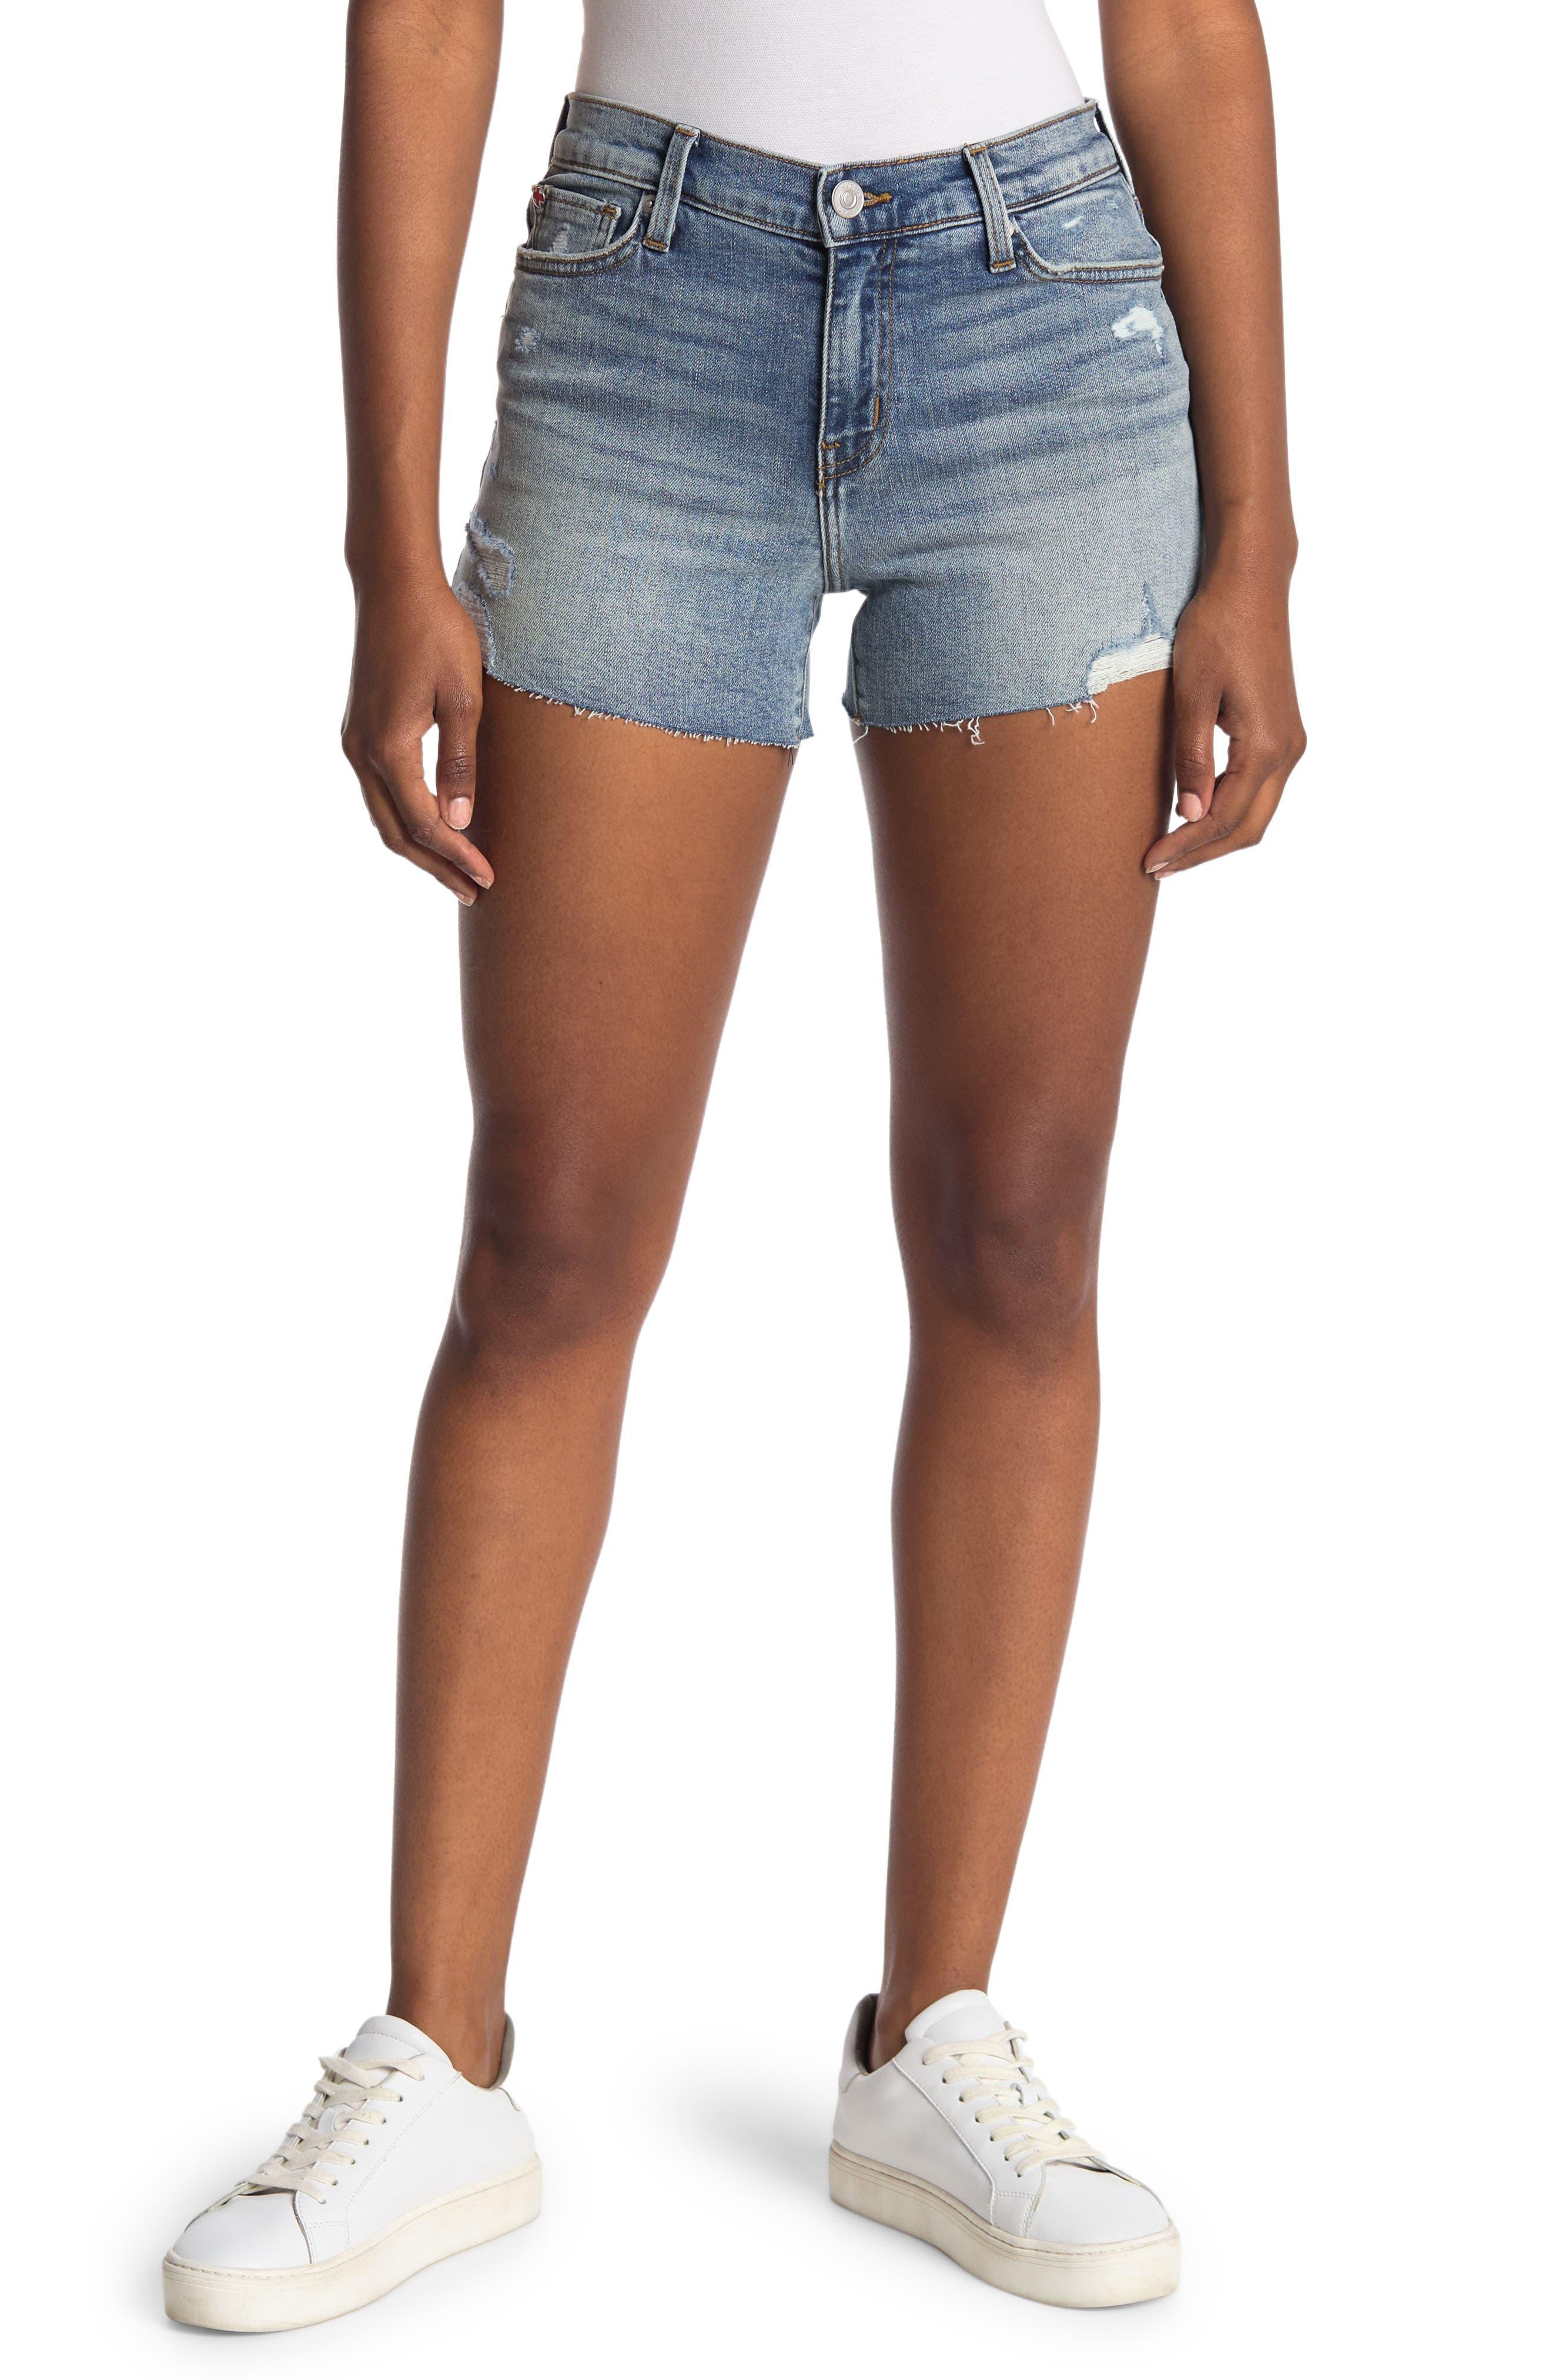 Image of HUDSON Jeans Graceie Mid Rise Distressed Raw Hem Denim Shorts